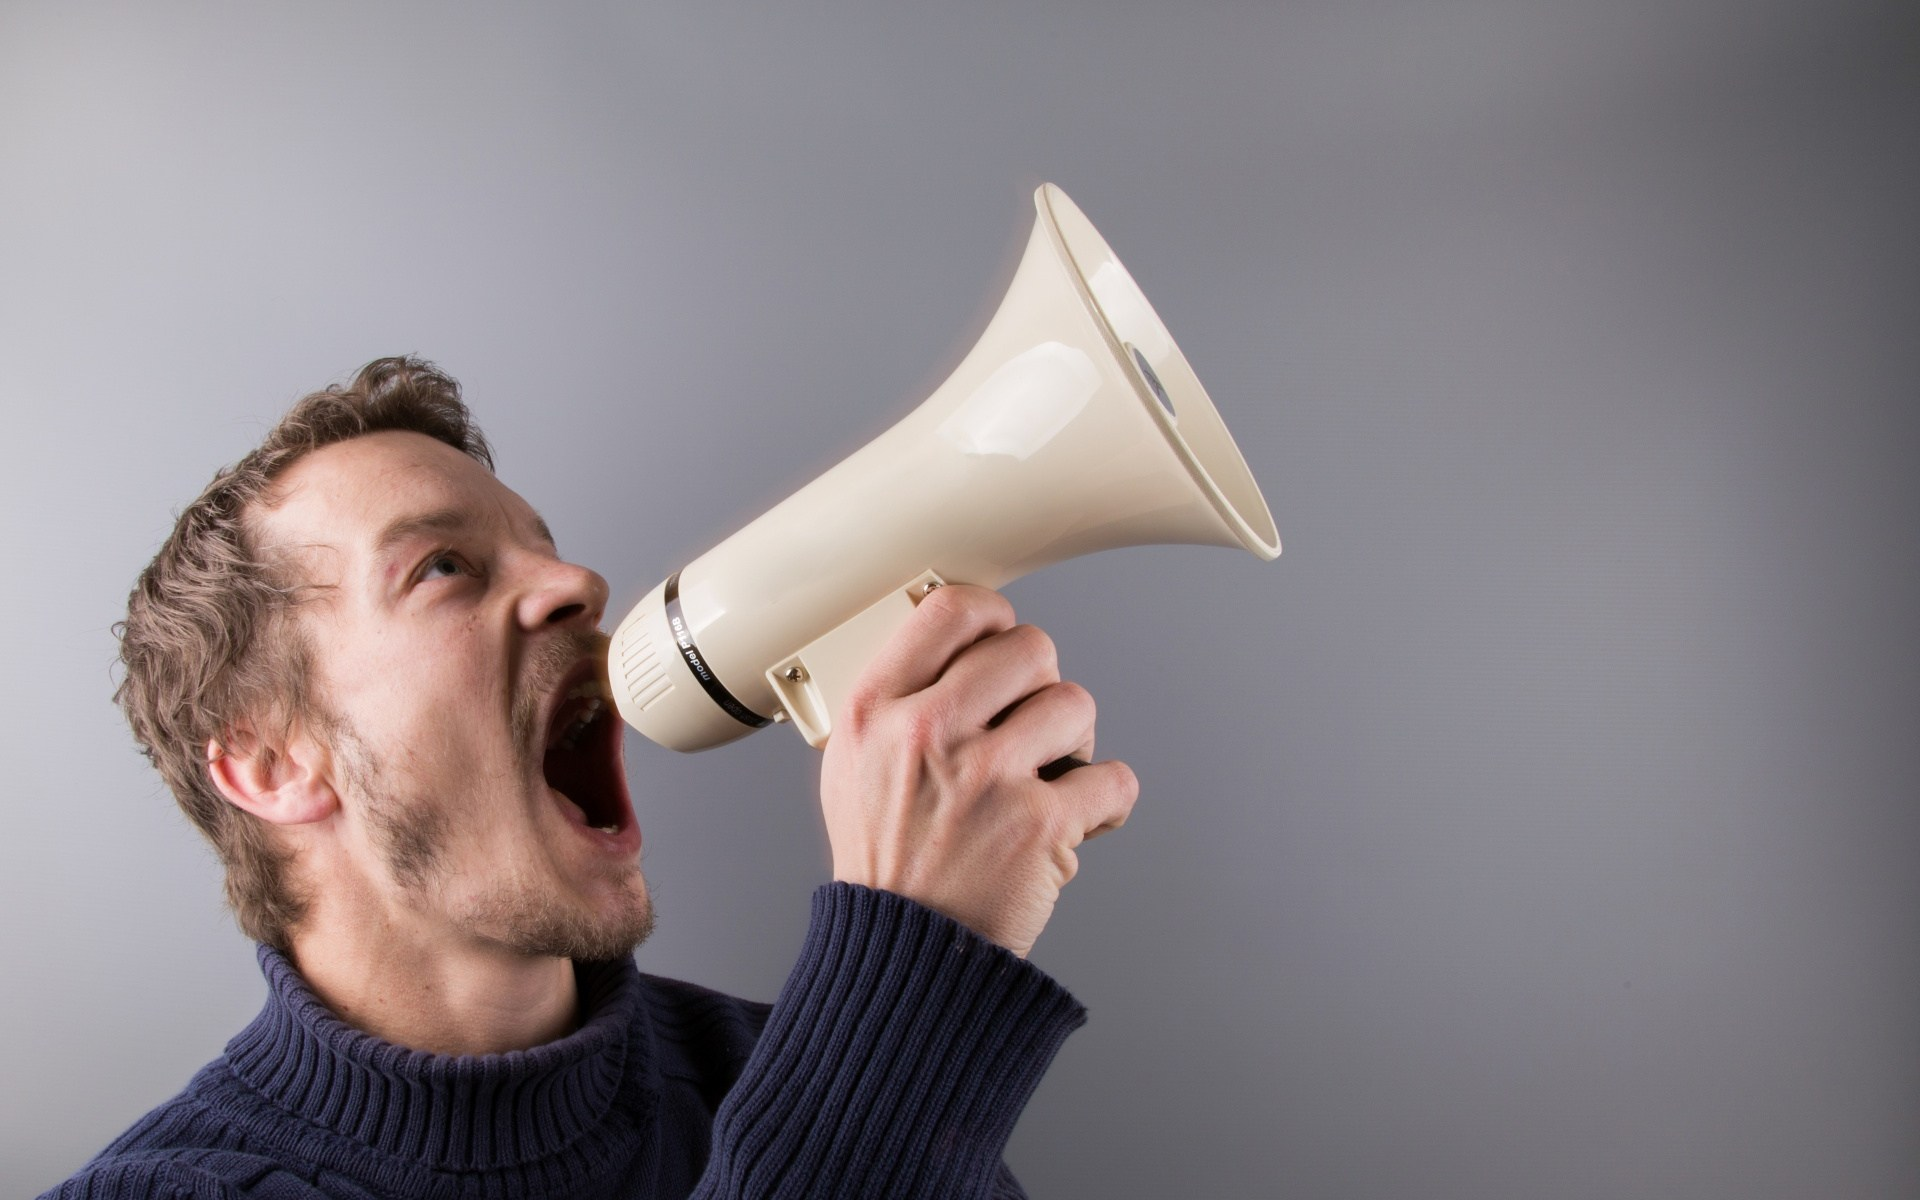 megaphone guy